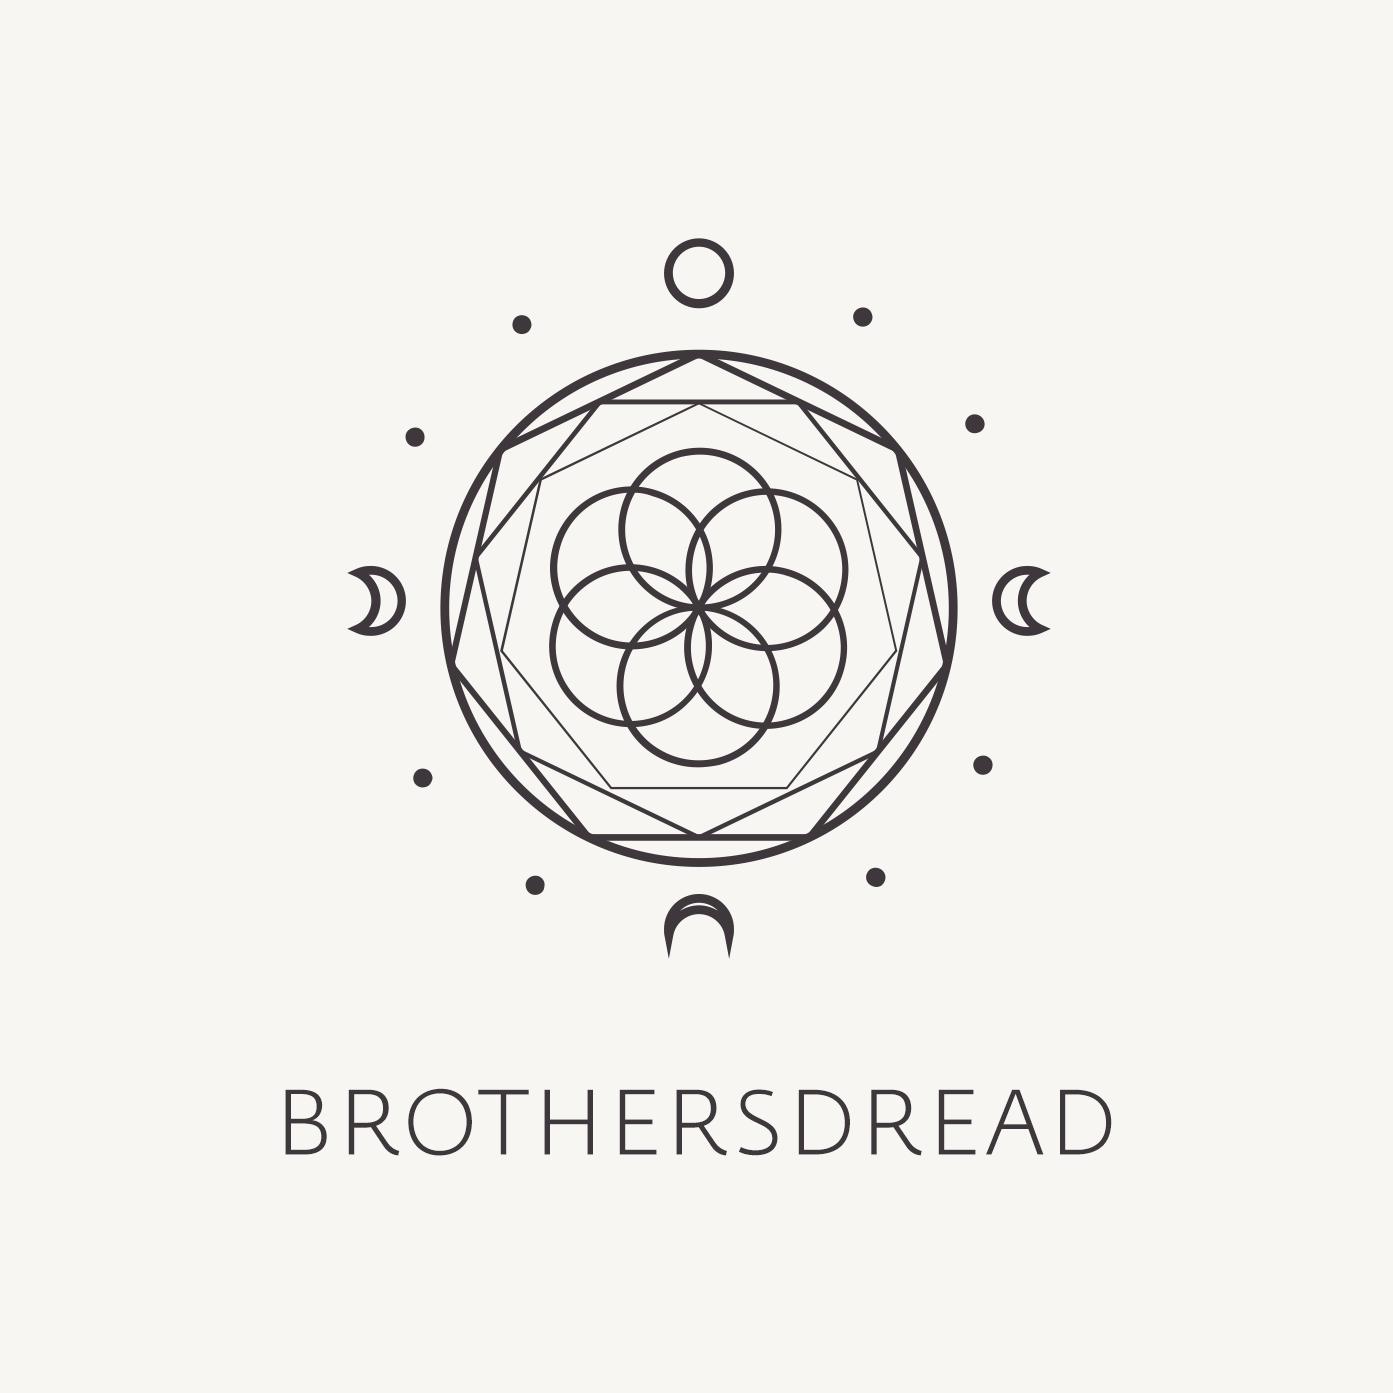 brothersdread